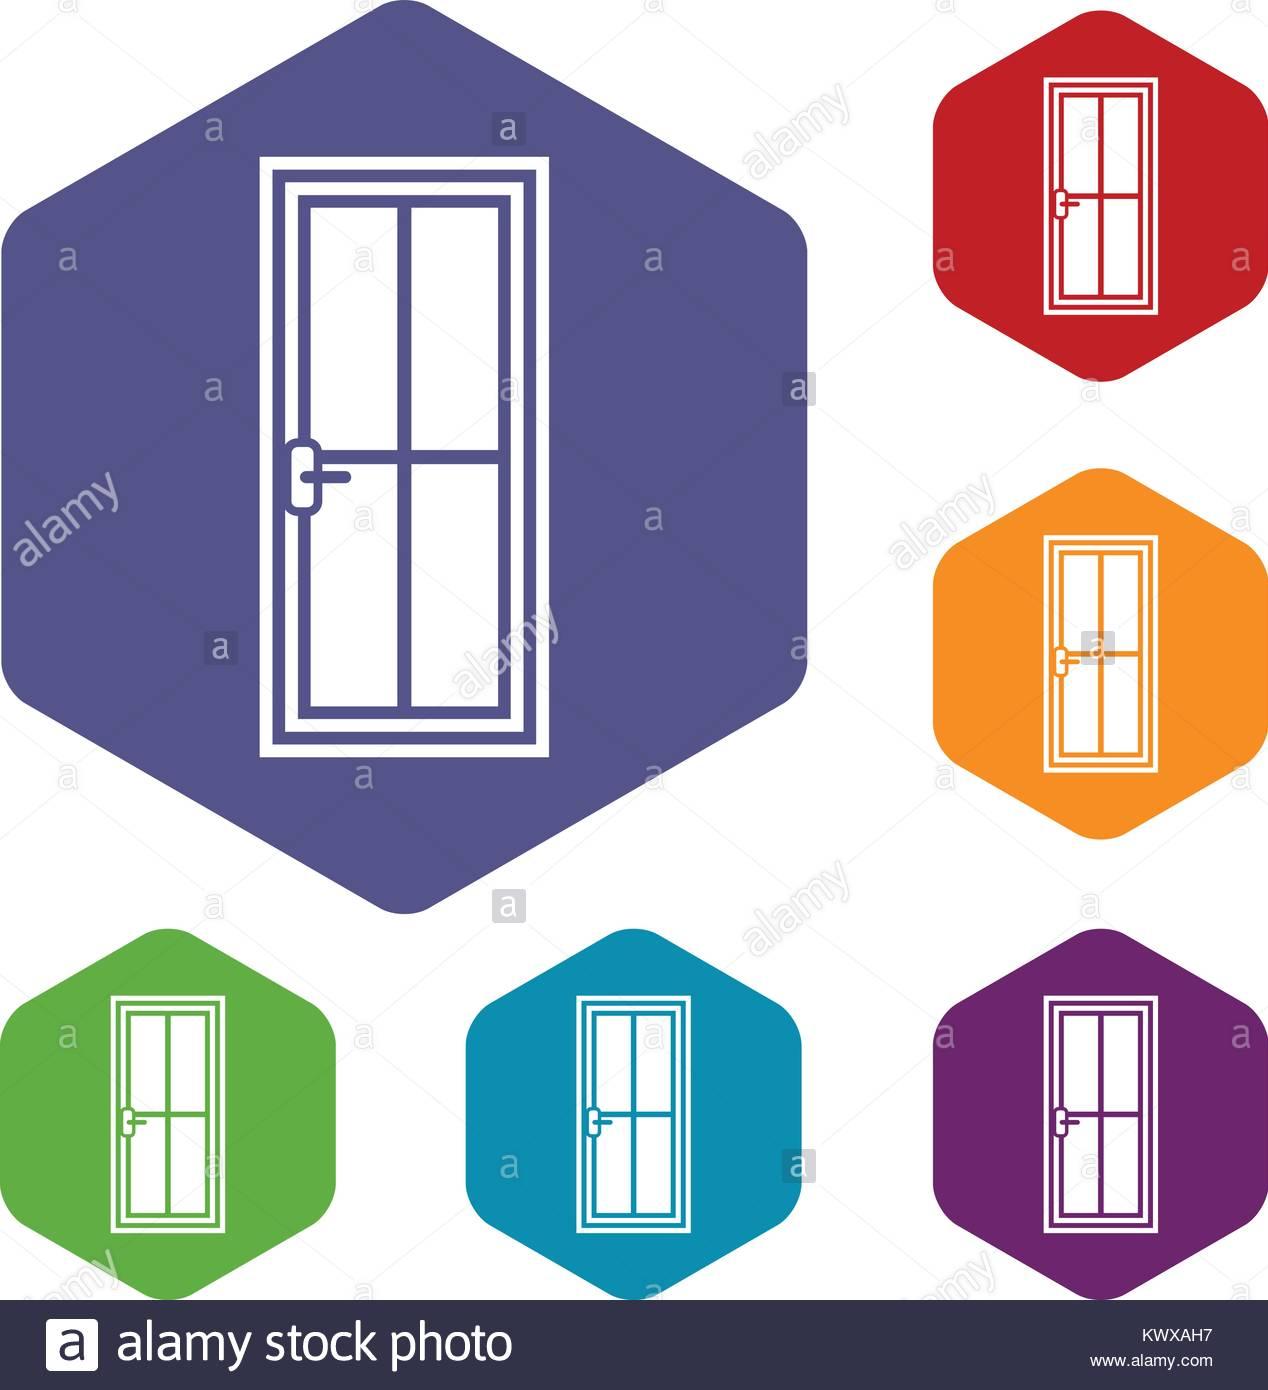 1268x1390 Door Knock Illustration Stock Photos Amp Door Knock Illustration